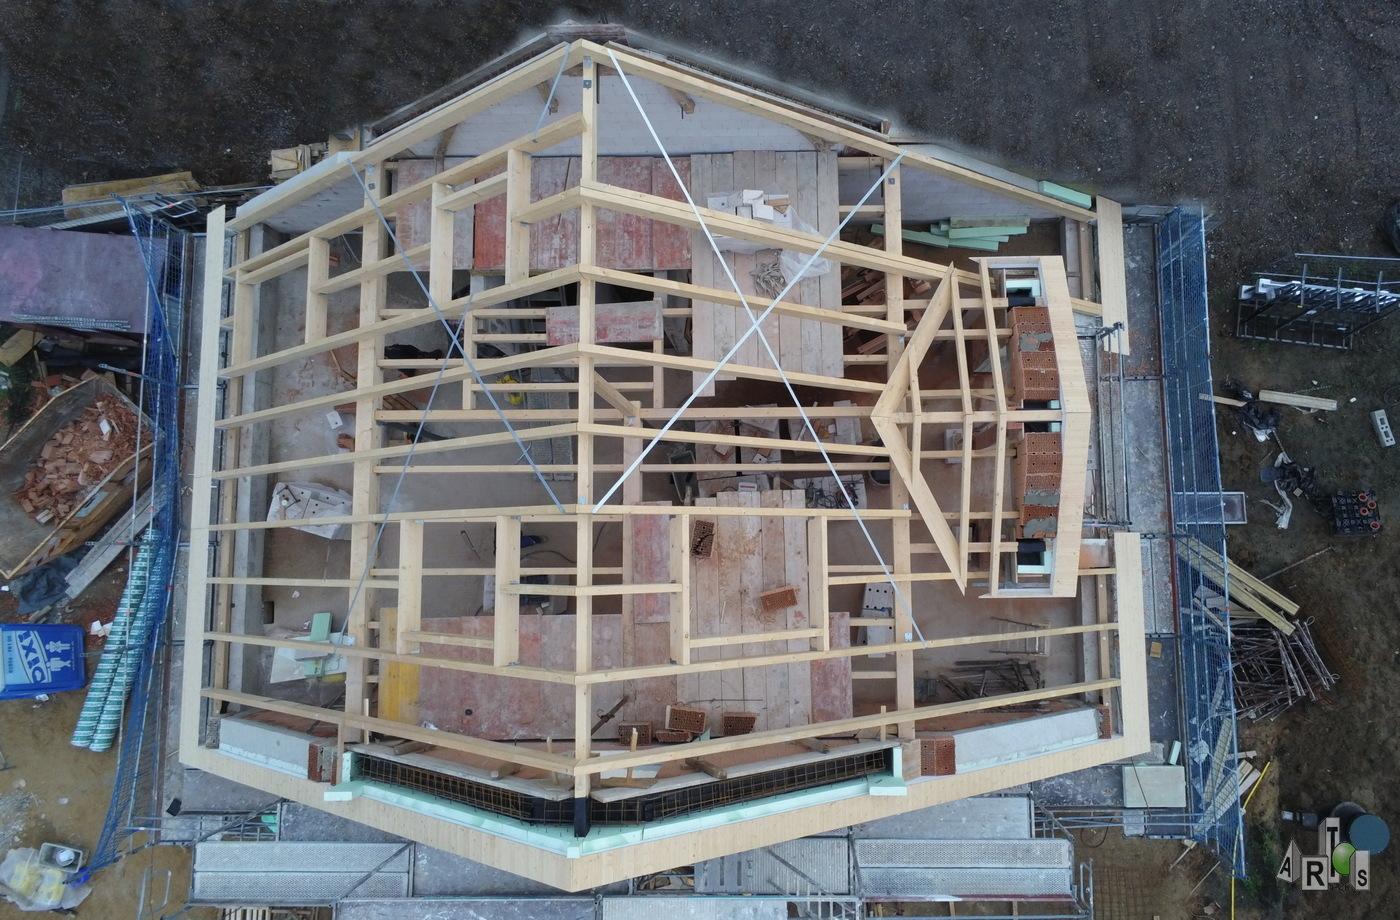 Dachstuhl wurde gesetzt, BV Hürth, DHH. ARTOS-HAUS Bild B